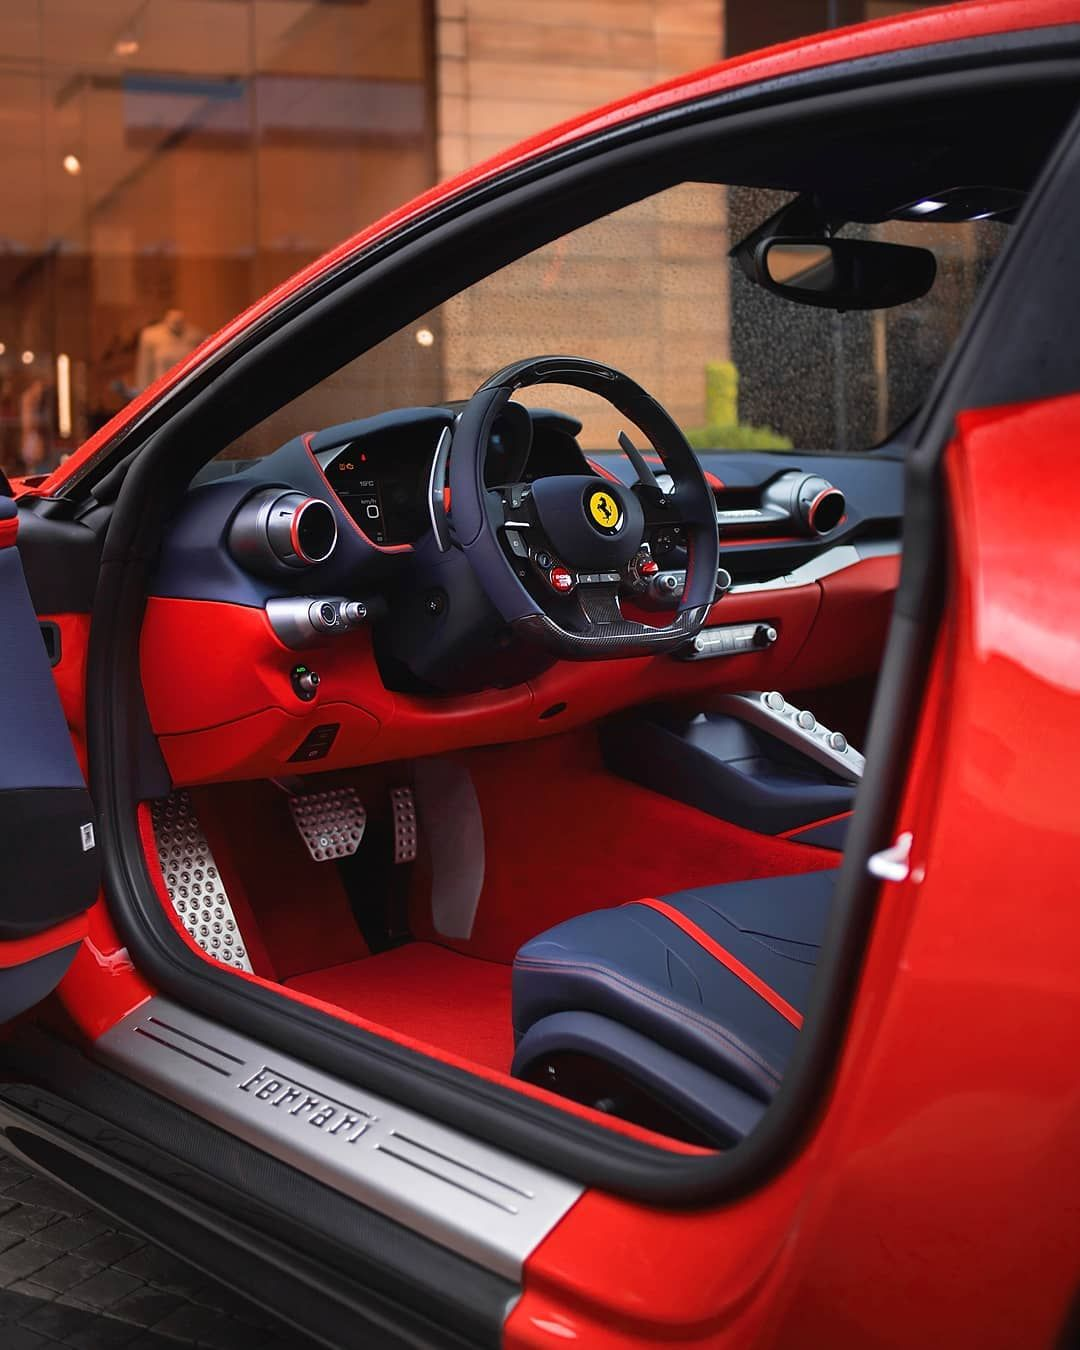 Red Ferrari Interior Clean Luxury Car Interior Fast Sports Cars Ferrari